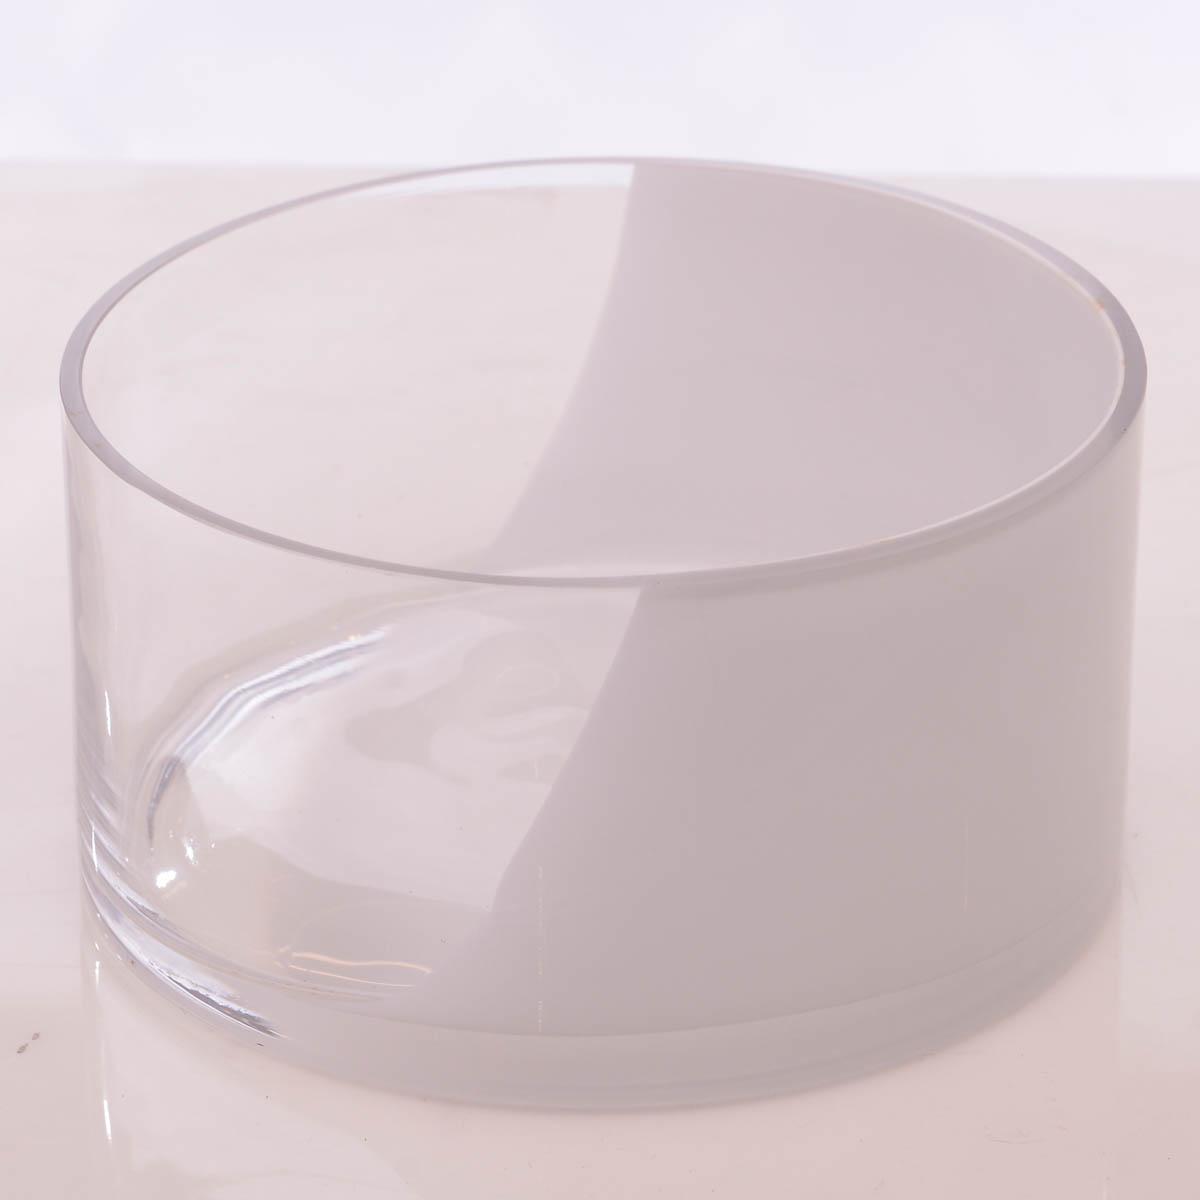 Centro mesa vidrio D 7,9 X H4